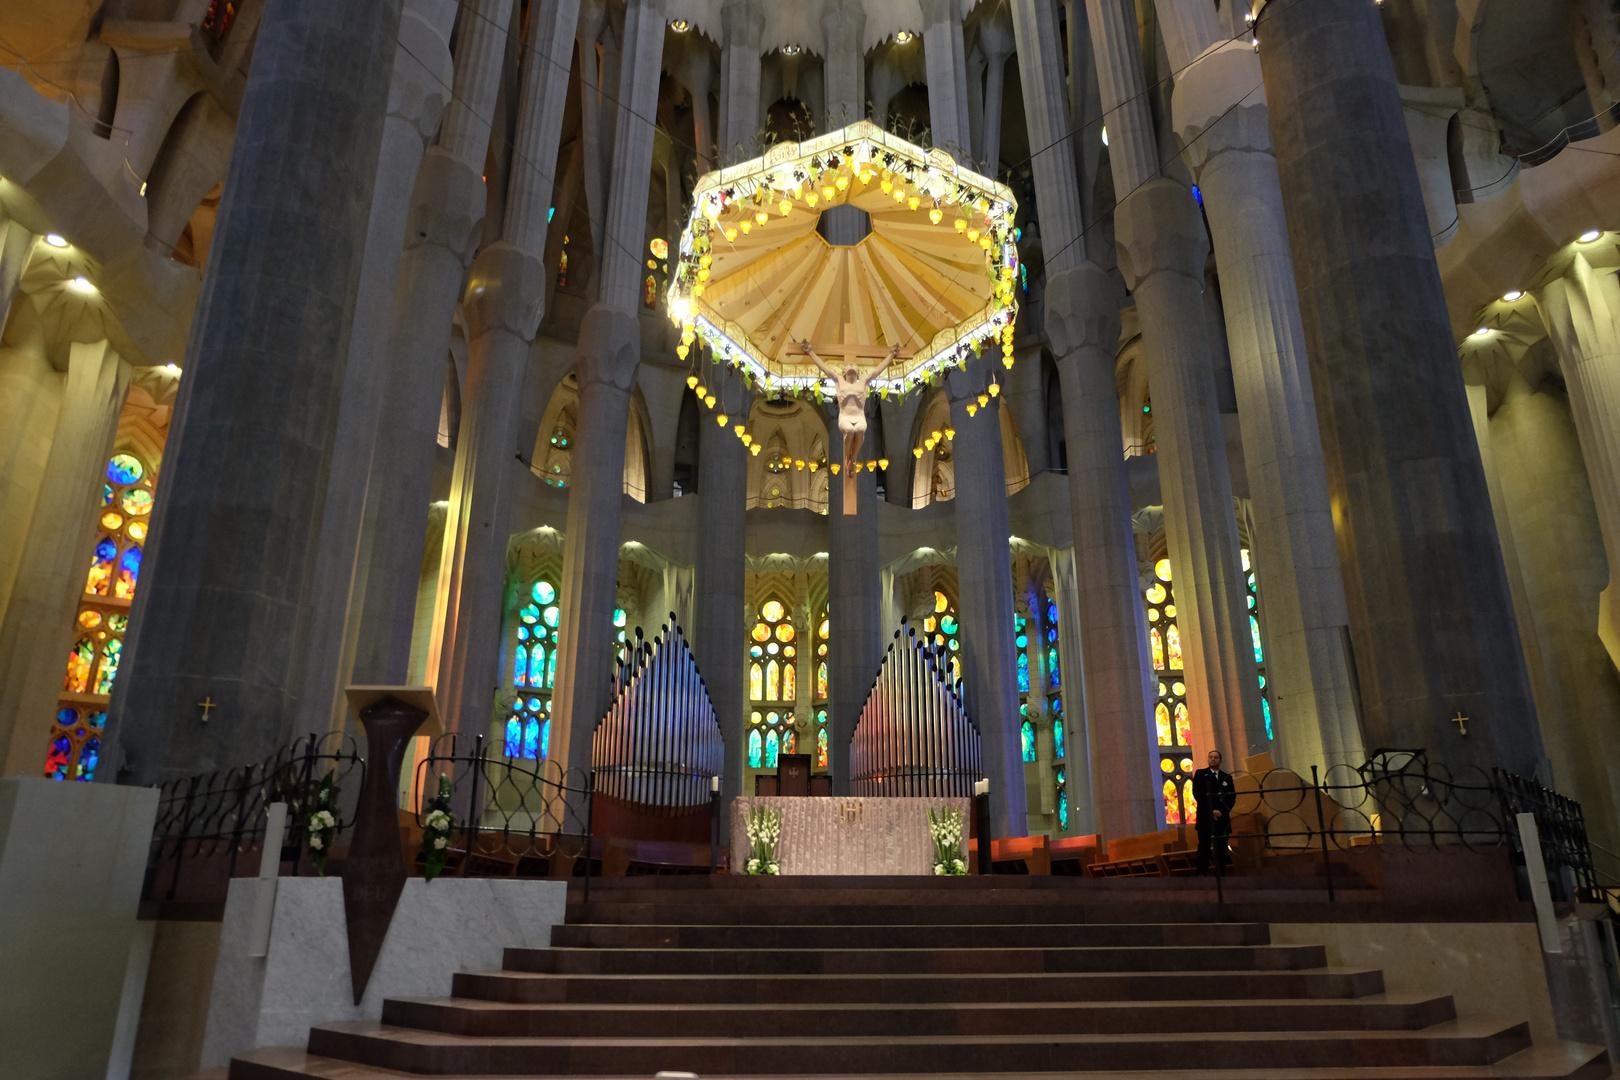 Barcelona (6) Antoni Gaudí i Cornet - Sagrada Família